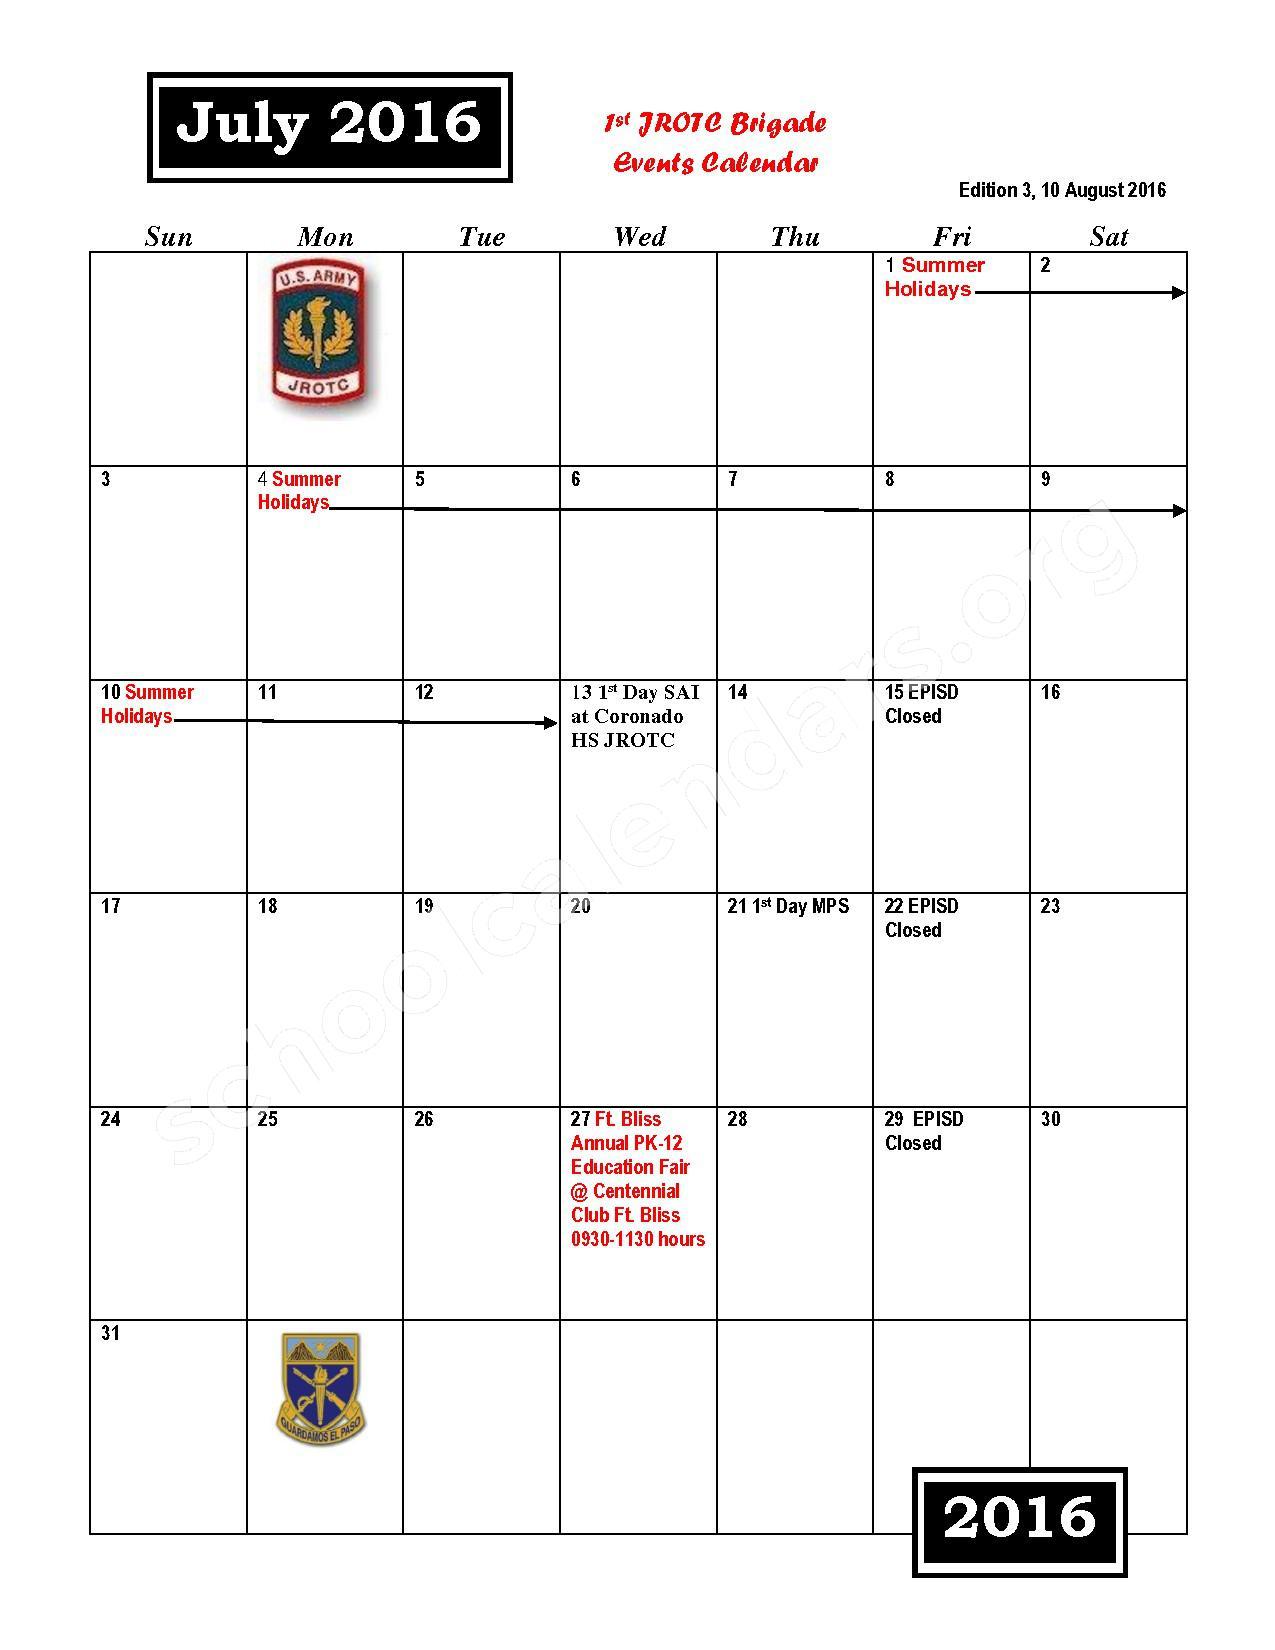 2016 - 2017 JROTC Events Calendar – Rivera Elementary School – page 1